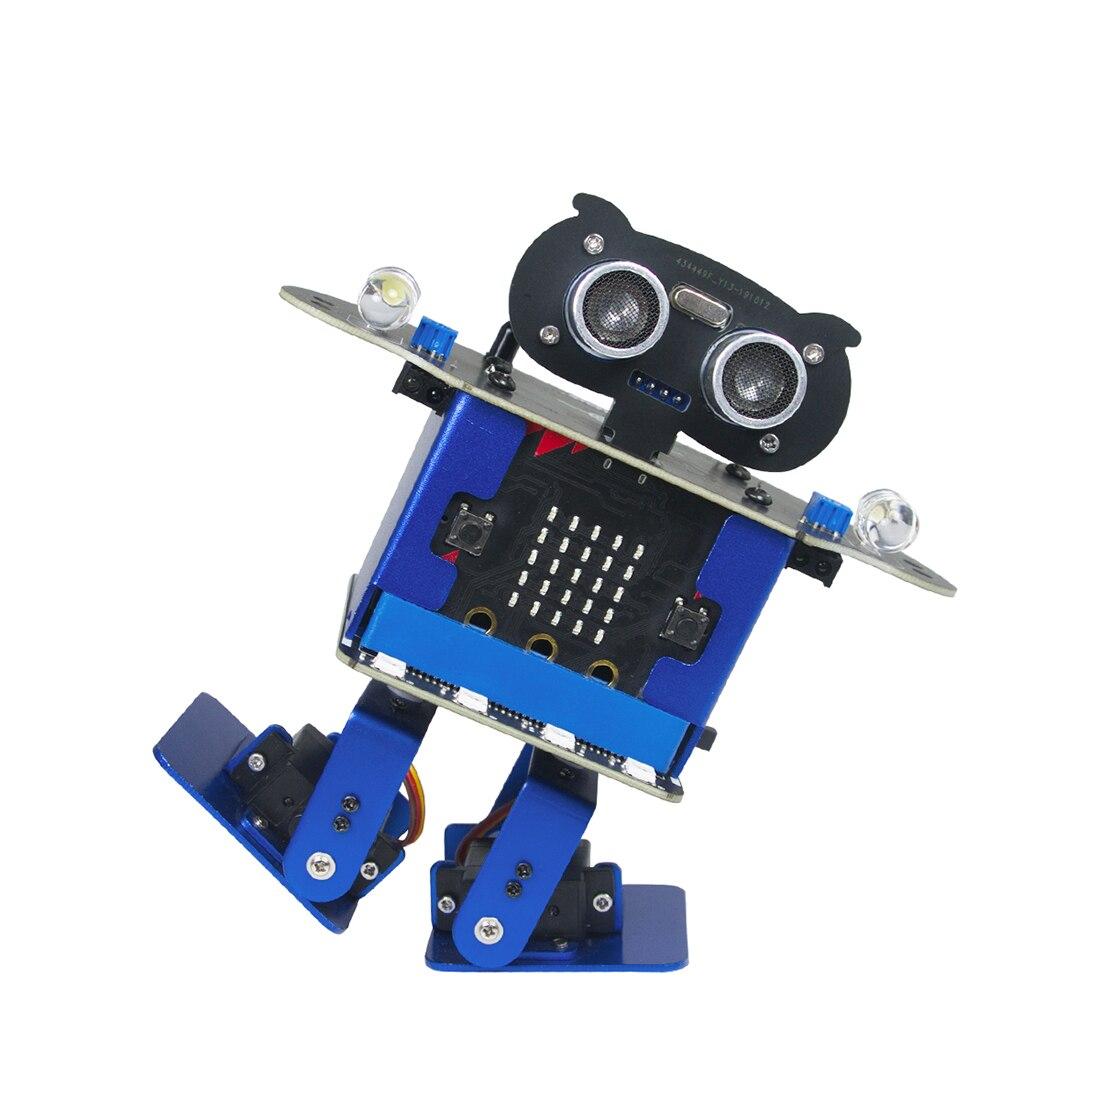 Programmable Dancing Robot Bipedal Humanoid Microbit Robot DIY Programming Starter Kit For Microbit Diy Programming Accessories